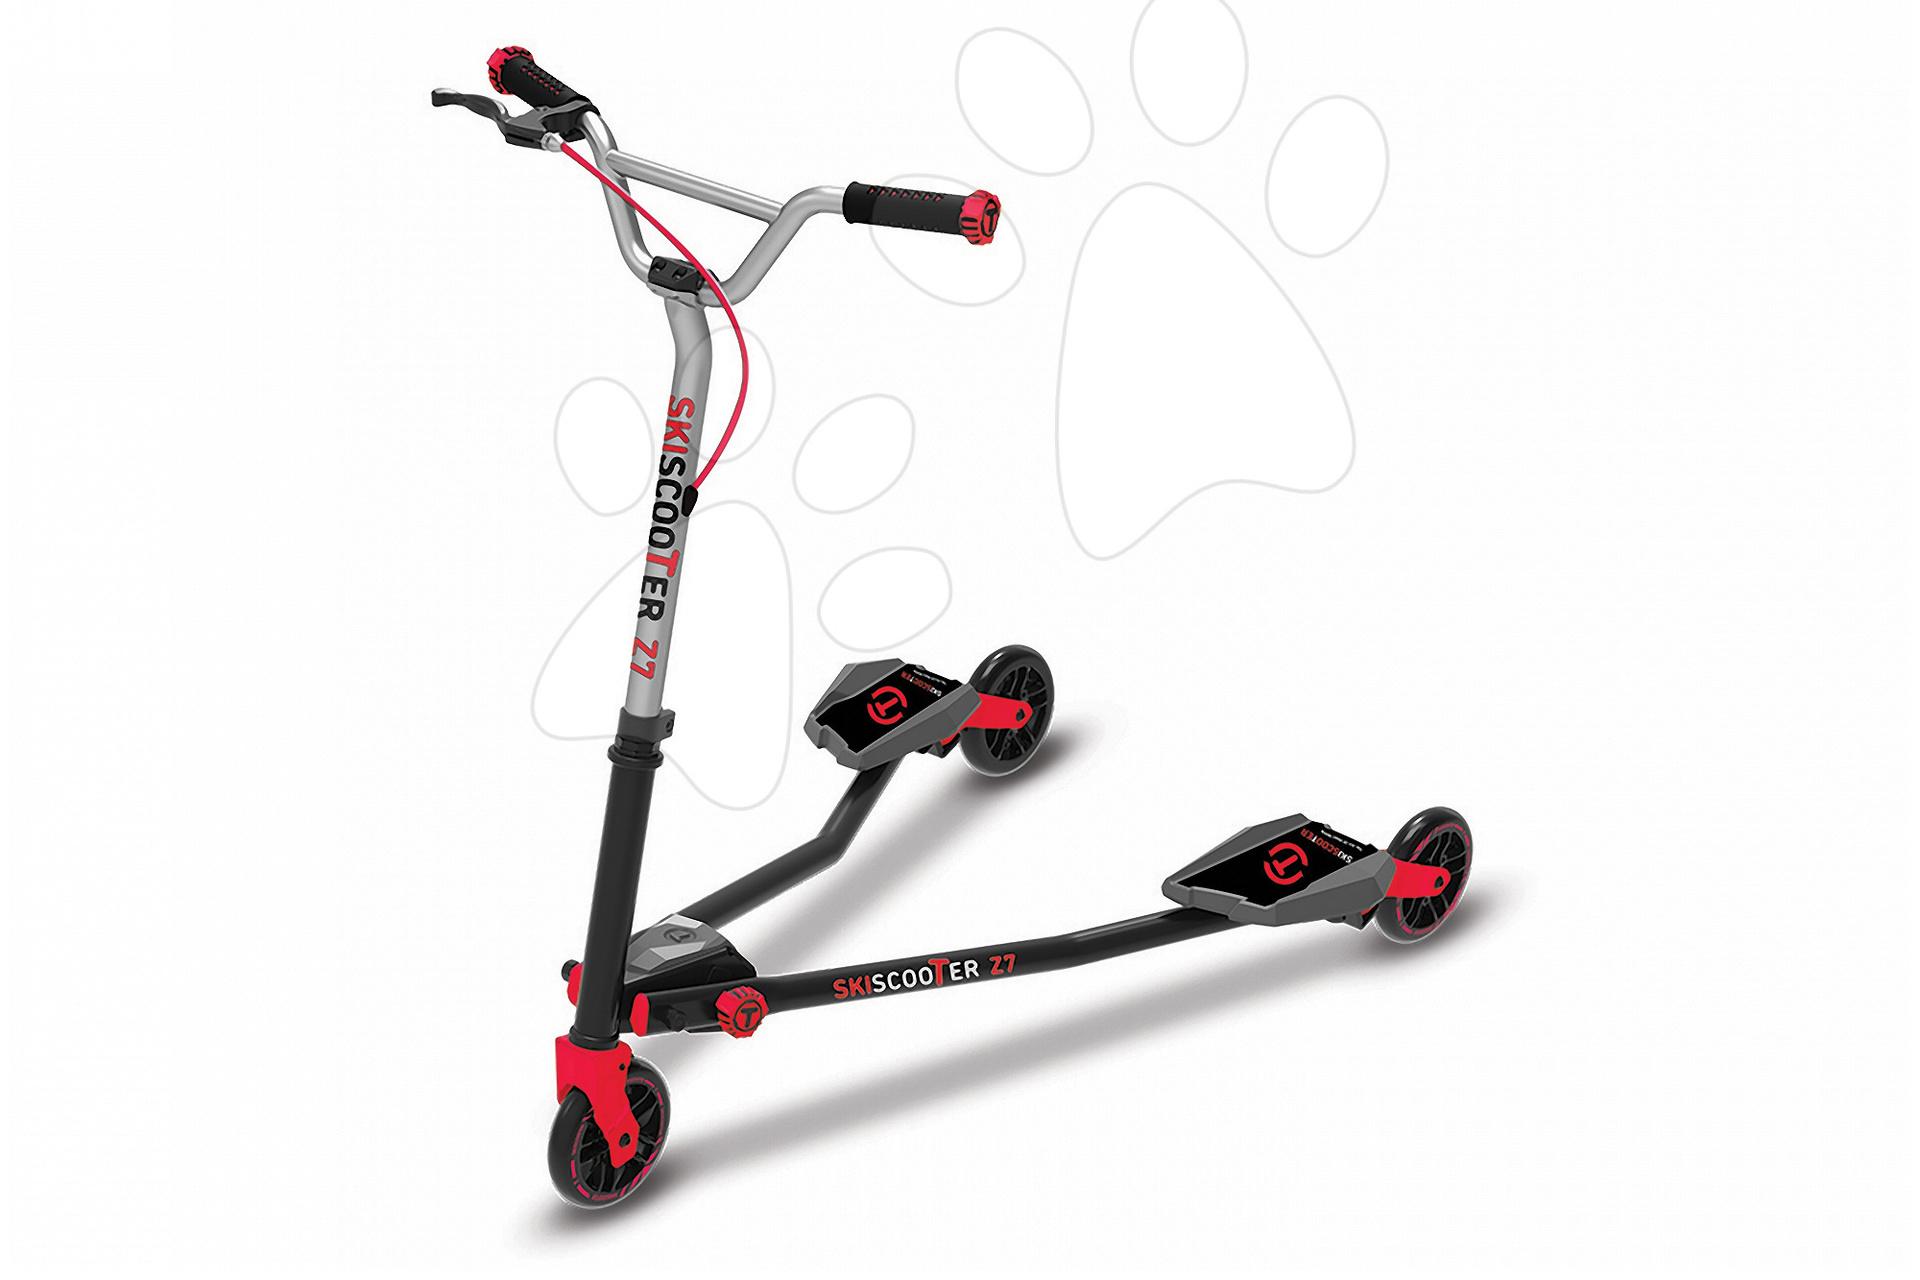 Roller SkiScooter síelés az úttesten smarTrike Z7 Red piros-fekete 7 évtől